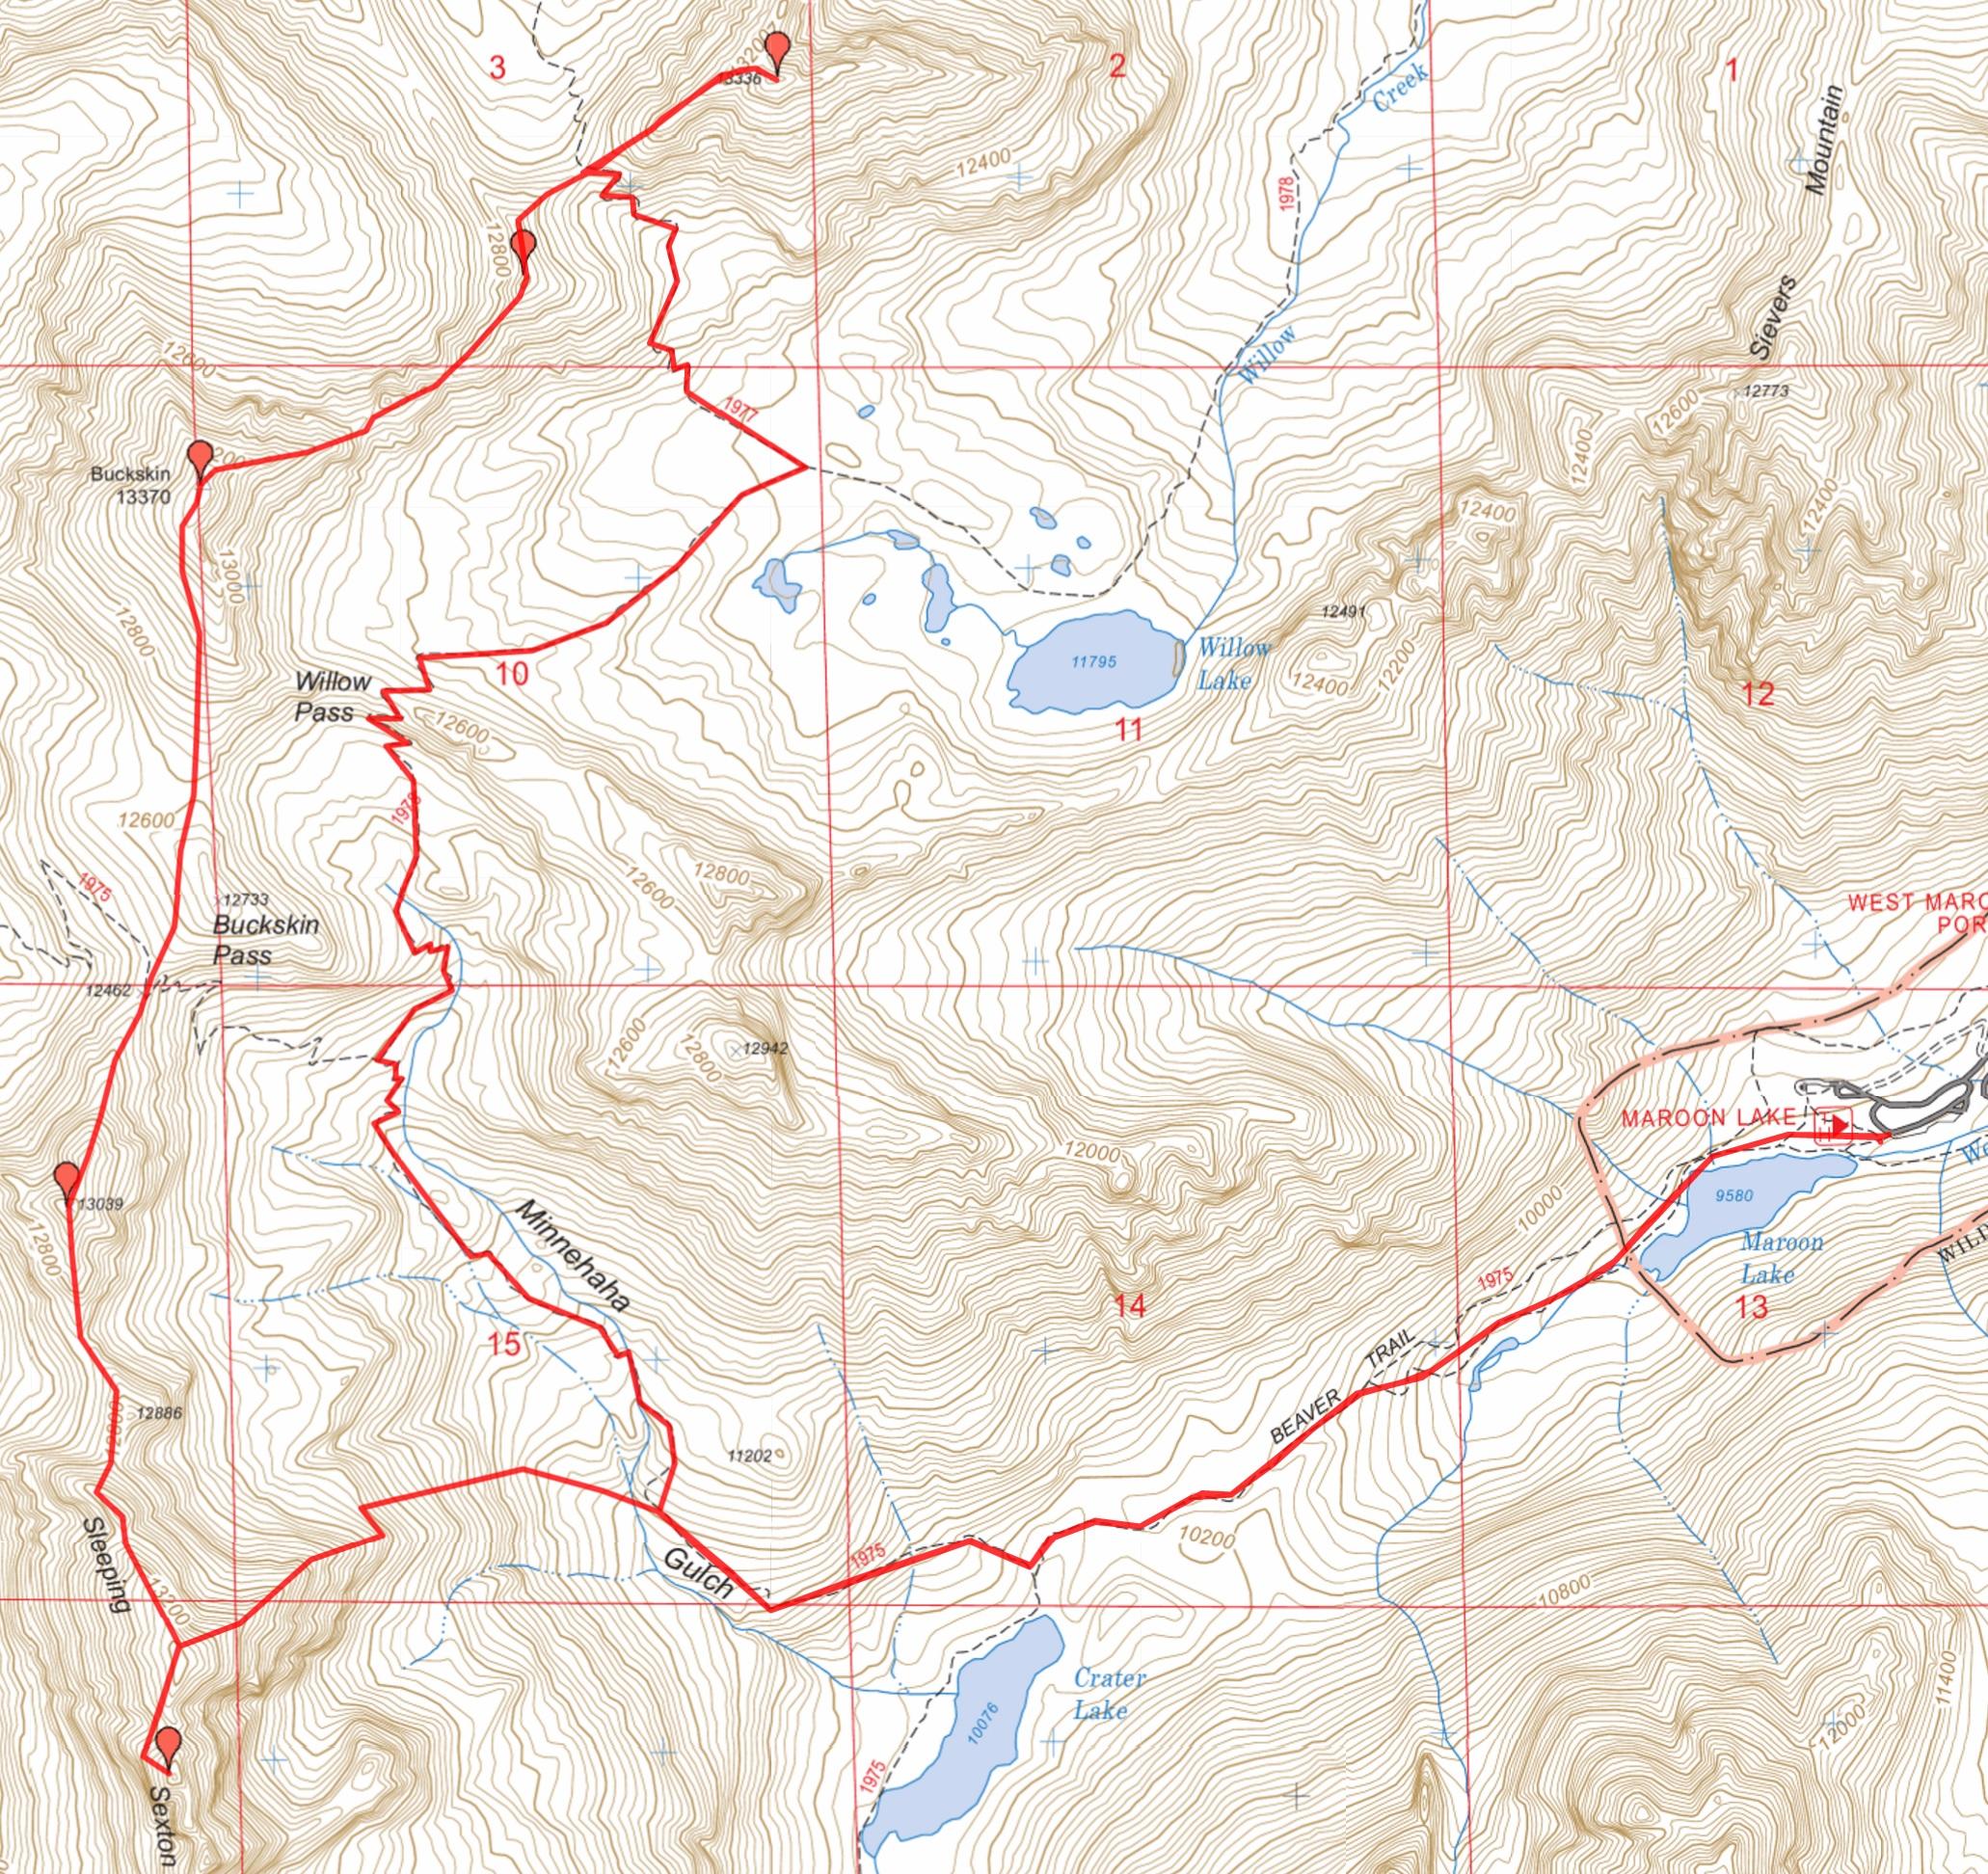 Colorado Ers Map X Poster Best Maps Ever Colorado Ers - 14ers map us